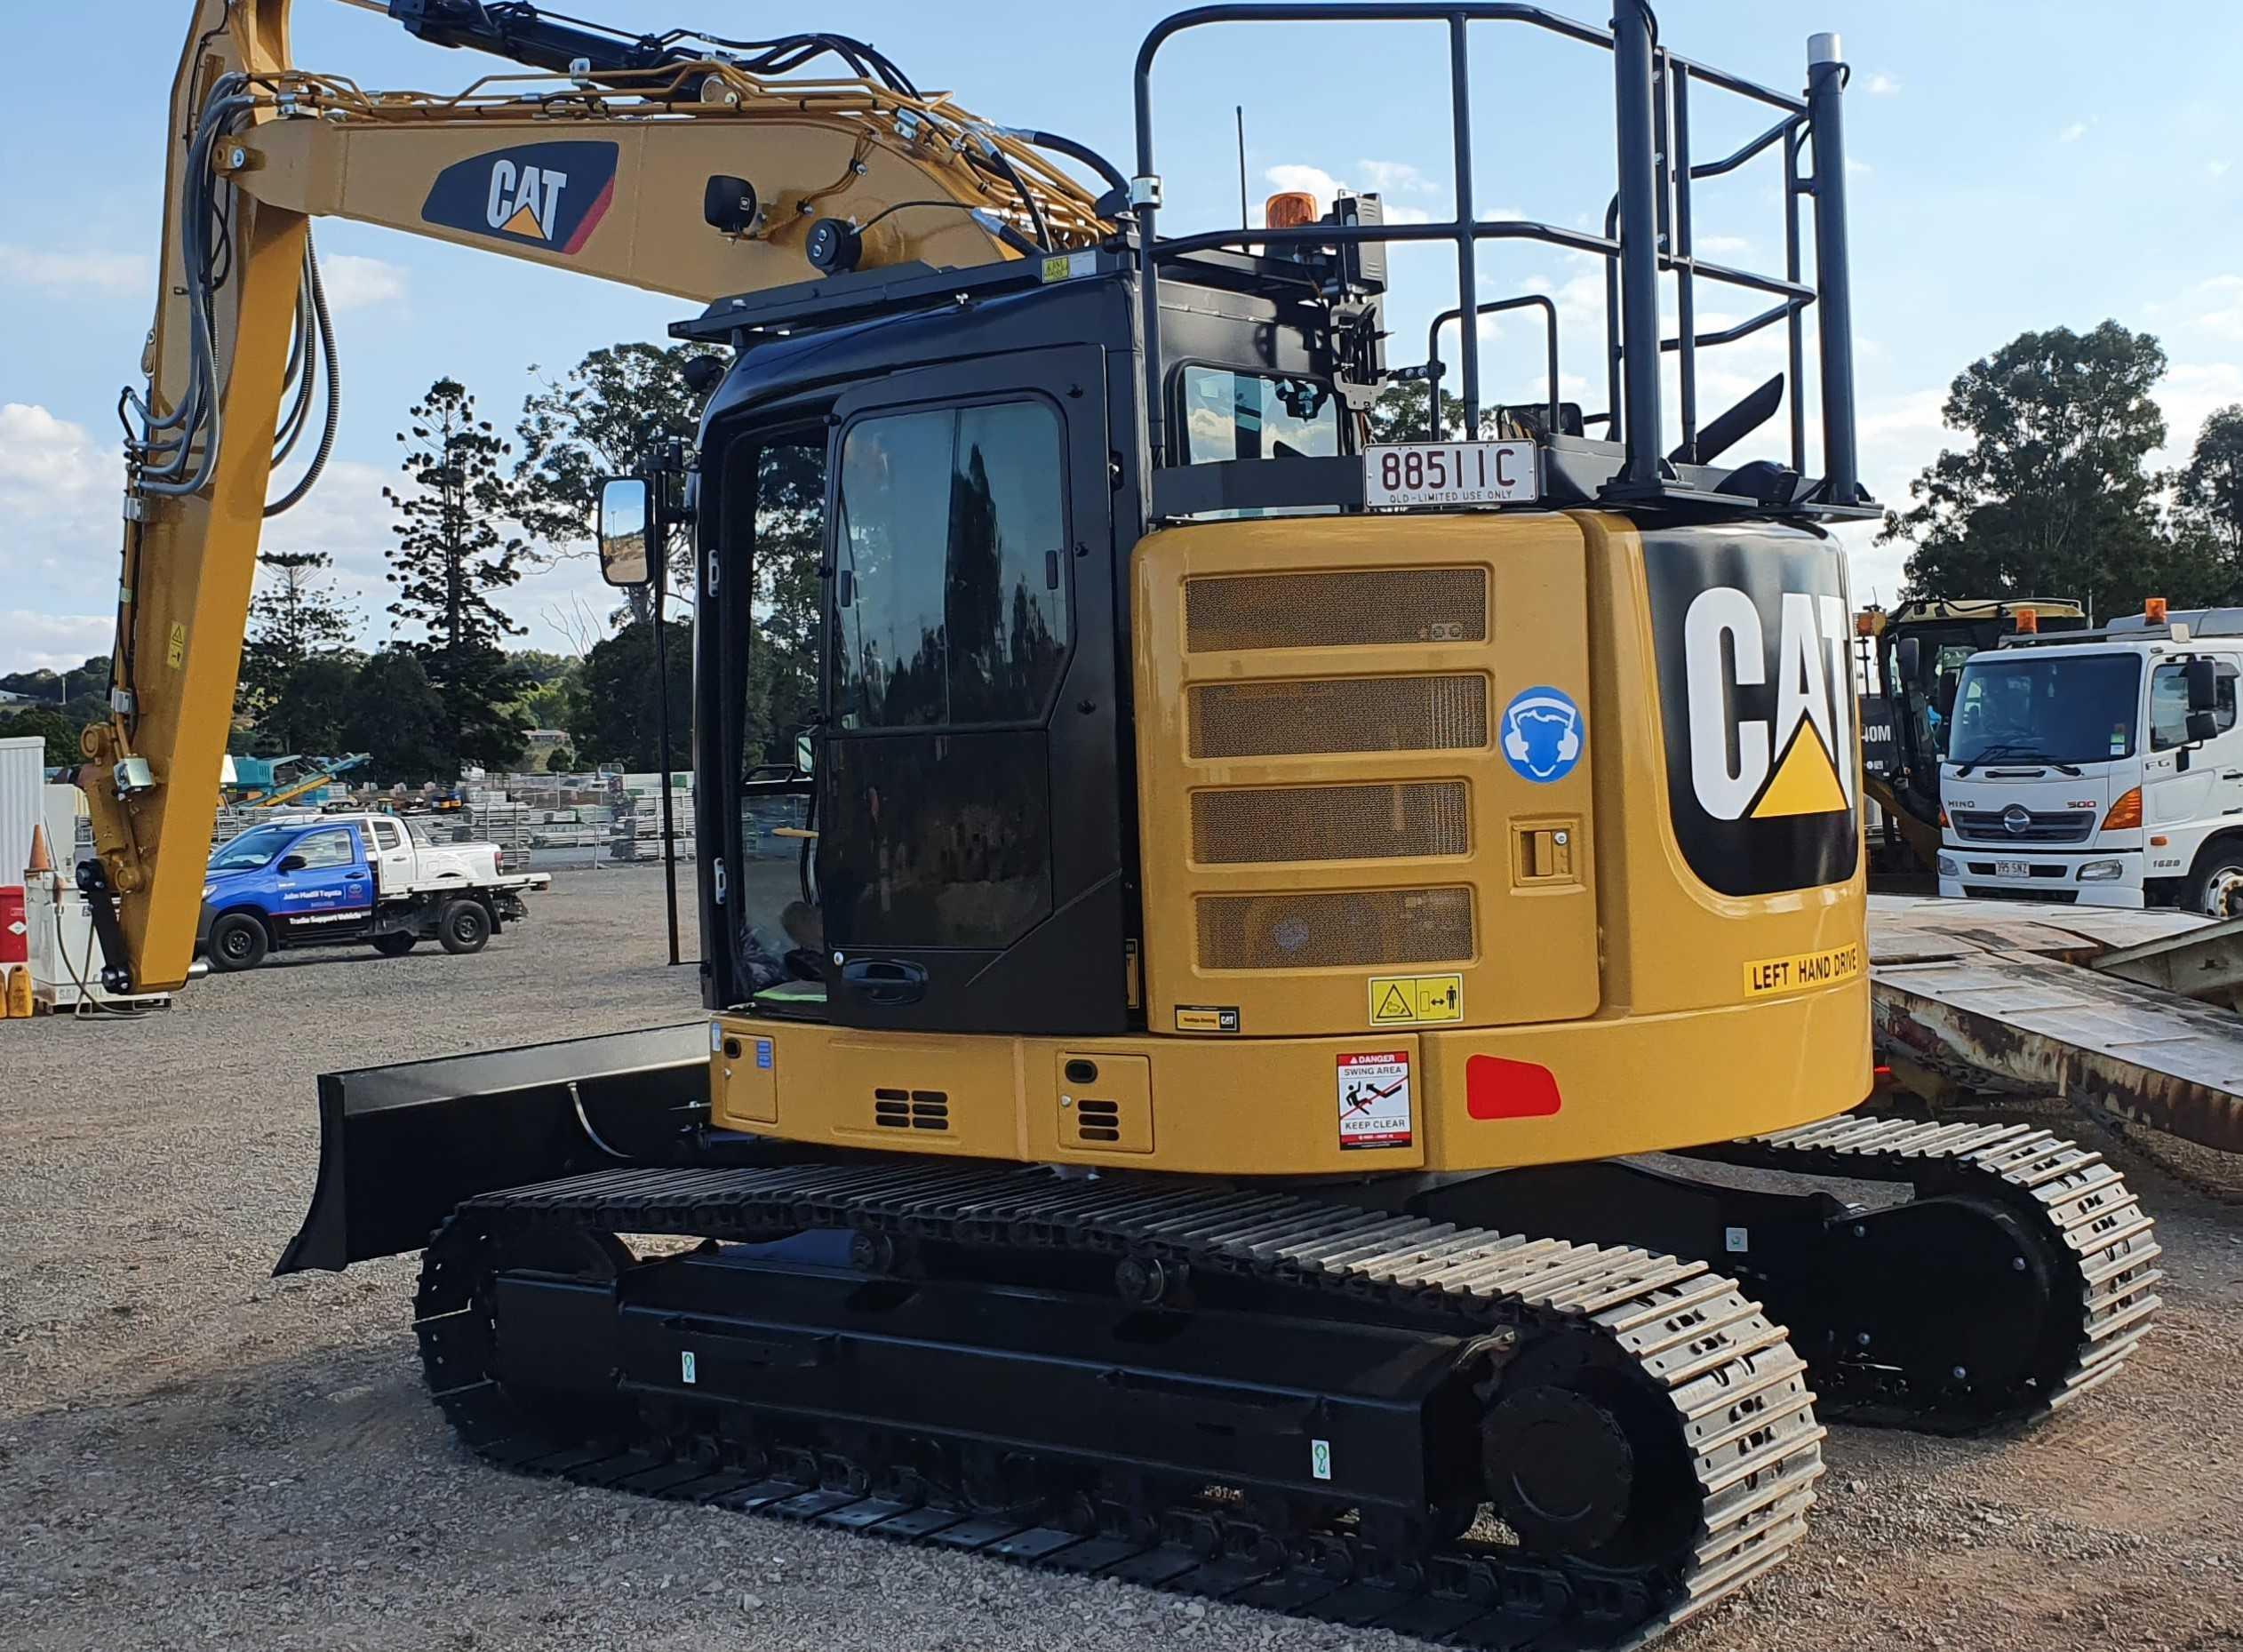 Hire 13-15 Tonne Tracked Excavators